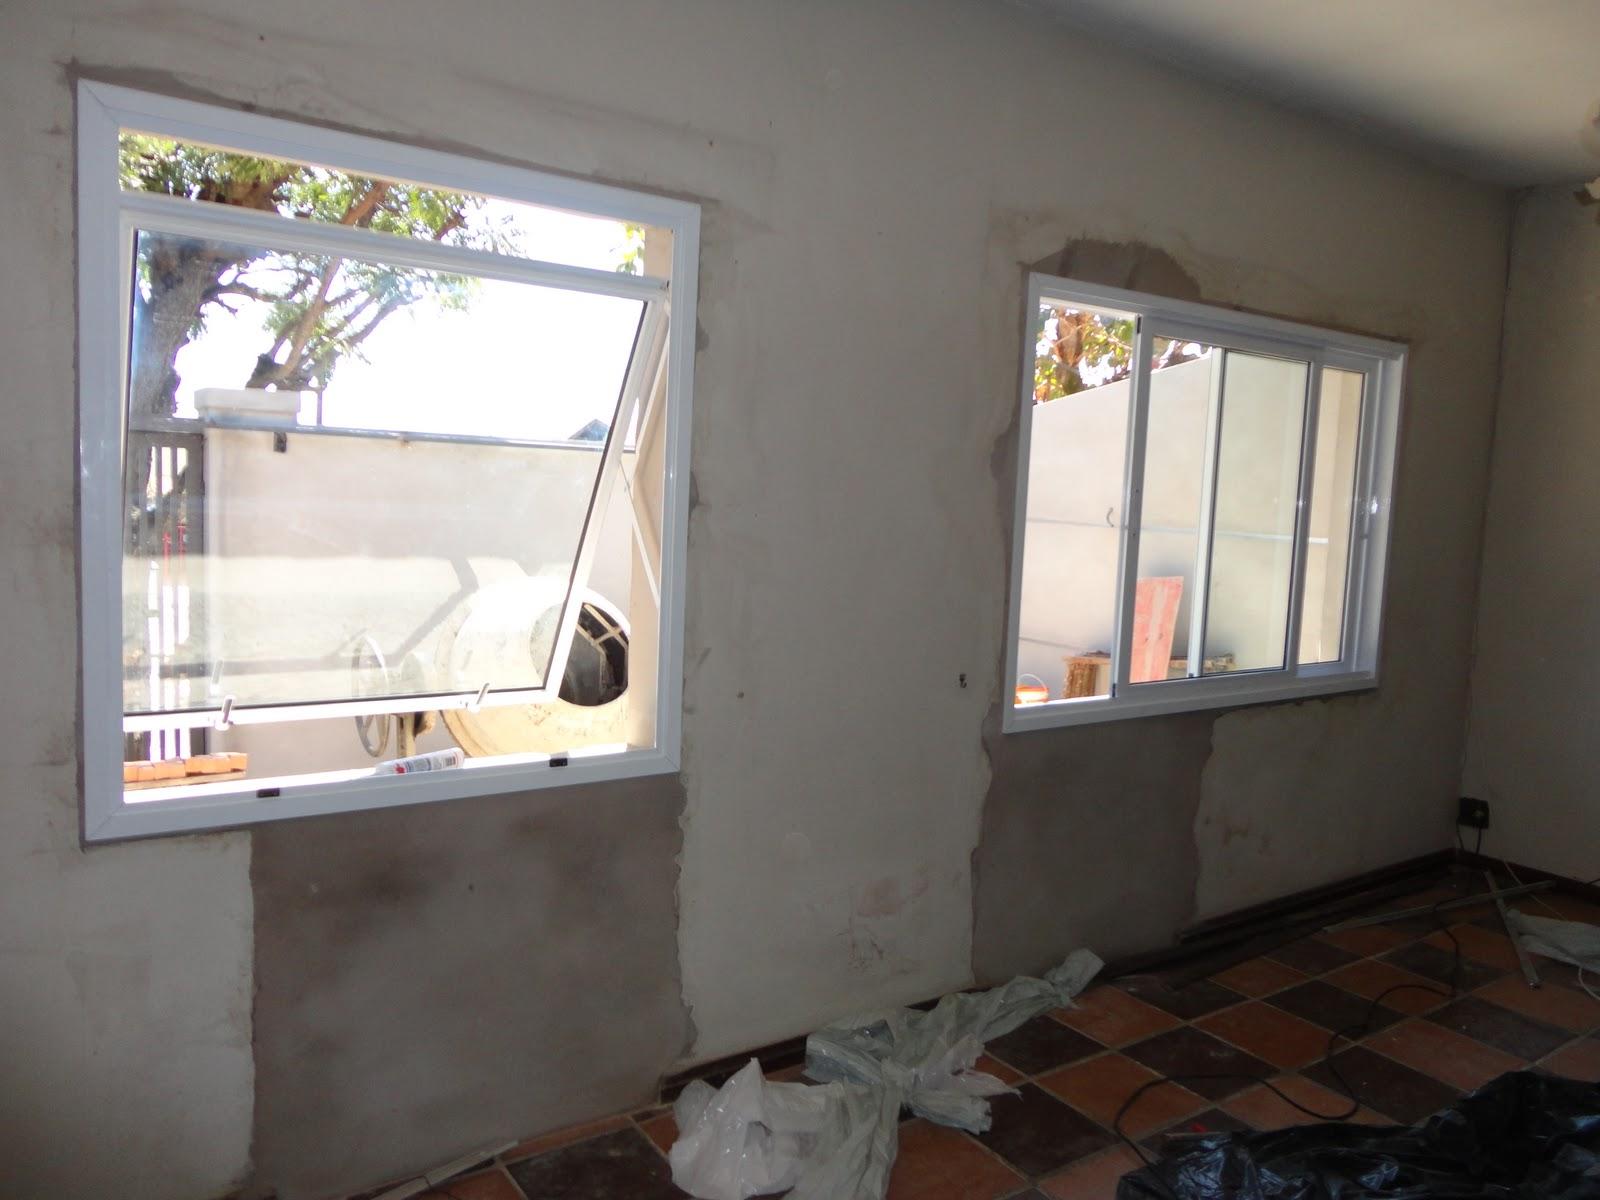 #896C42  reforma de nossa casa: Luz e beleza: janelas amplas e porta veneziana 4408 Janela Aluminio Maxiar